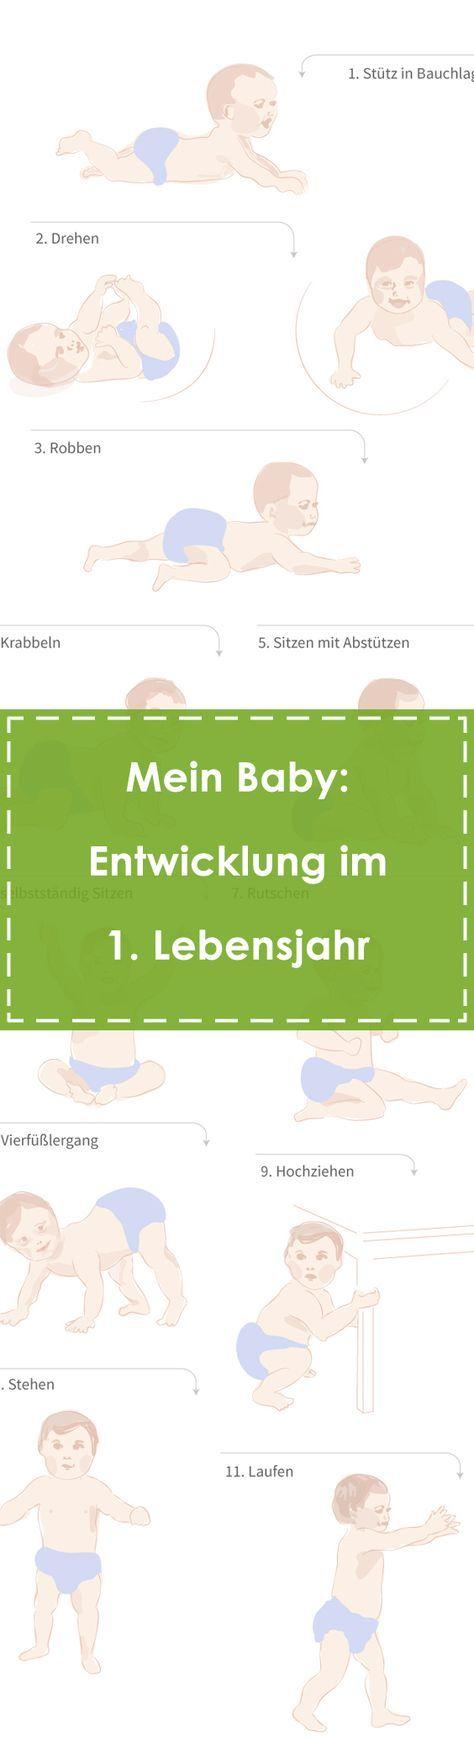 25 best baby 1 jahr ideas on pinterest baby erster. Black Bedroom Furniture Sets. Home Design Ideas